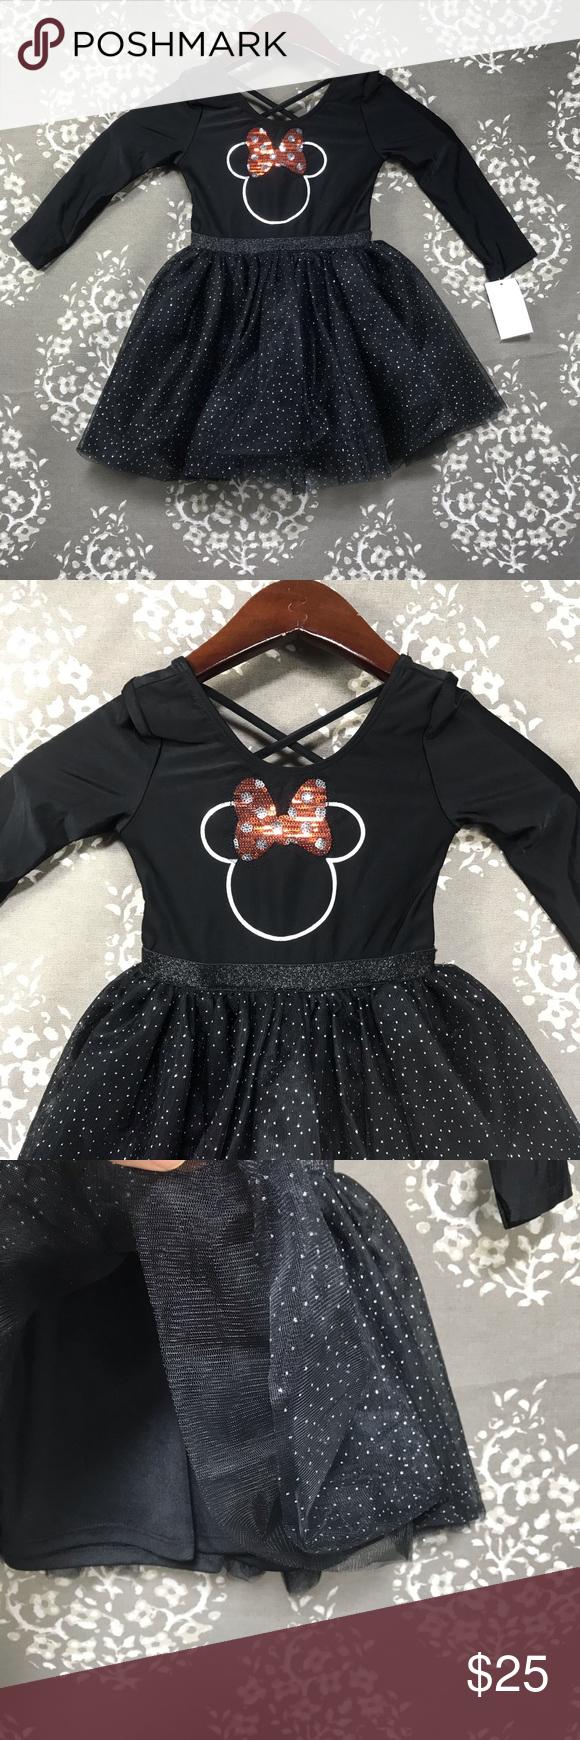 Minnie 3t Black Dress Sparkle Xmas Christmas Casual Dresses Dresses Disney Dresses [ 1740 x 580 Pixel ]